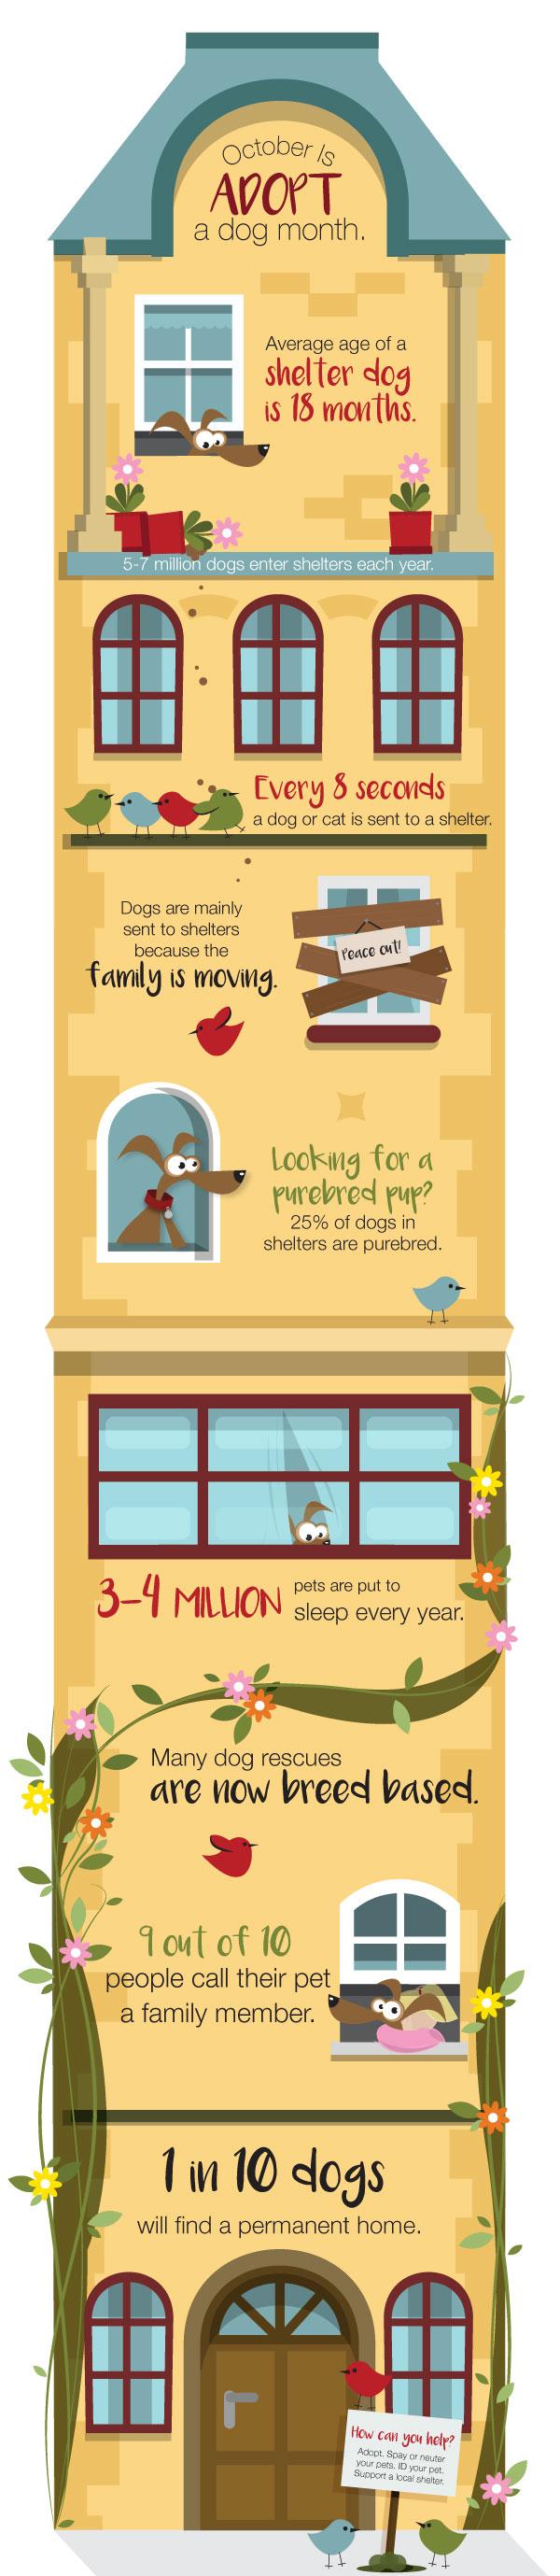 Adopt-a-Dog-Month2.jpg